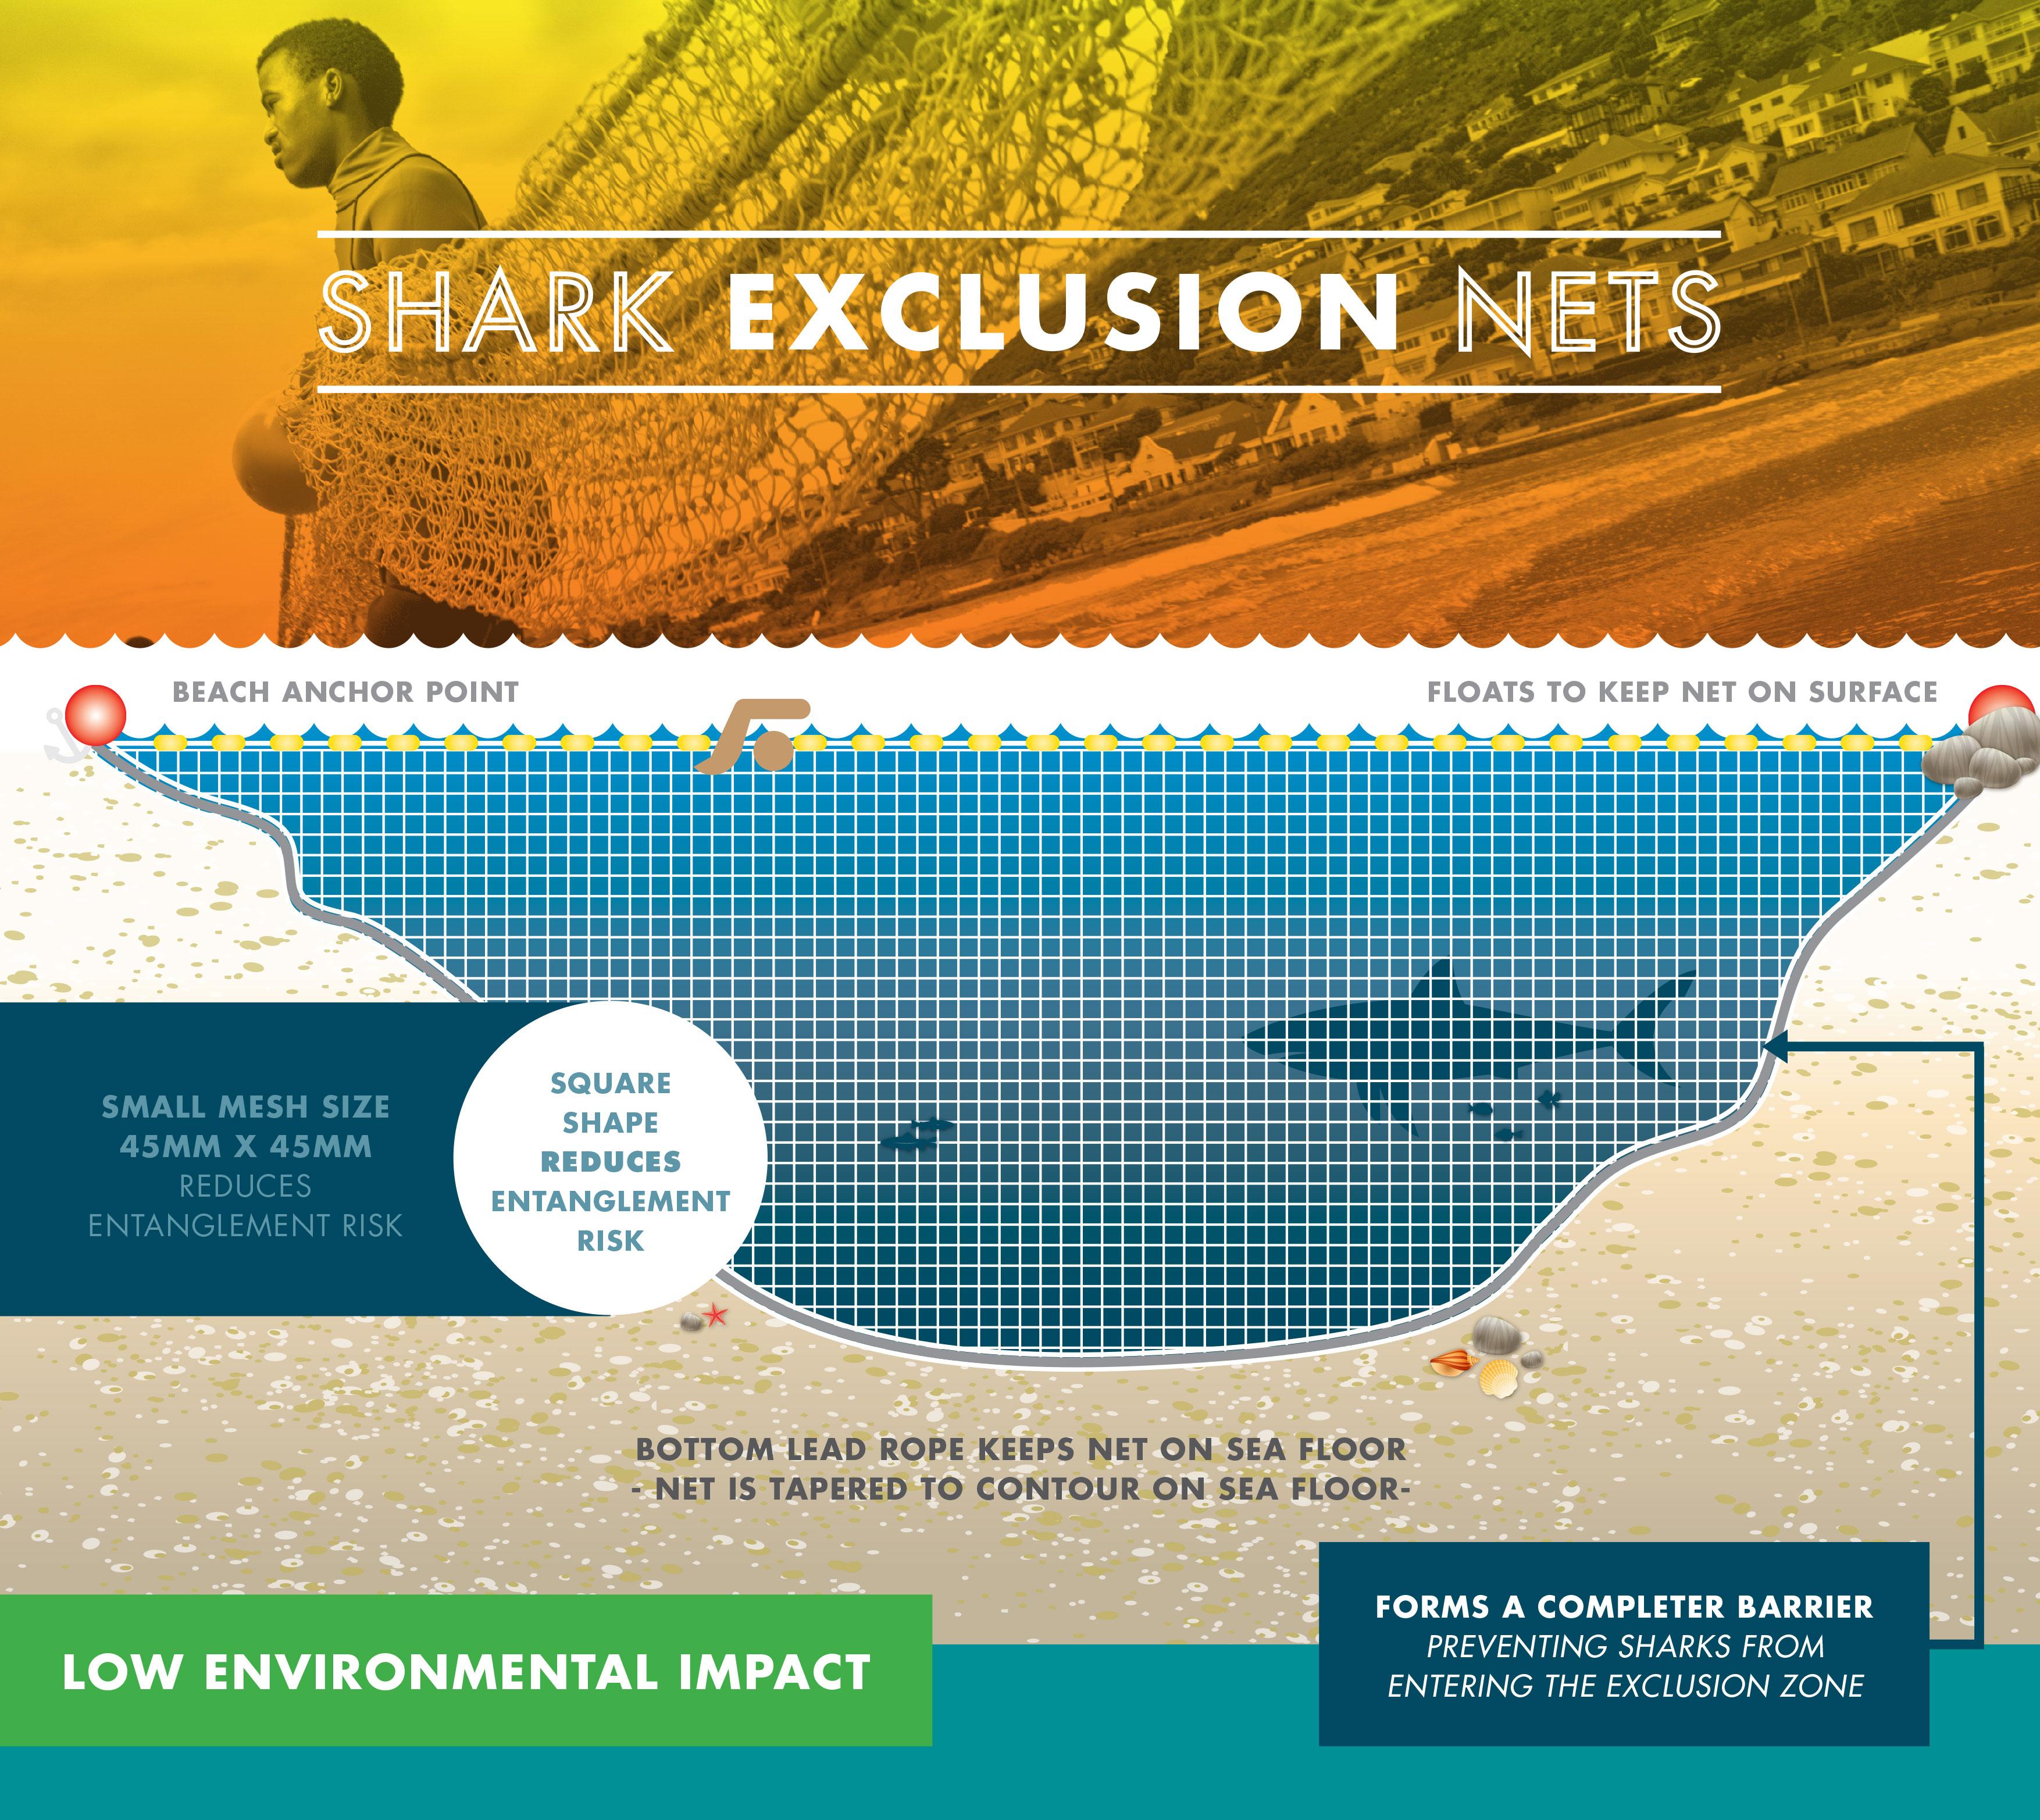 SS2162_Shark Spotters_Shark Net vs Shark Exclusion Net_Graphic_5